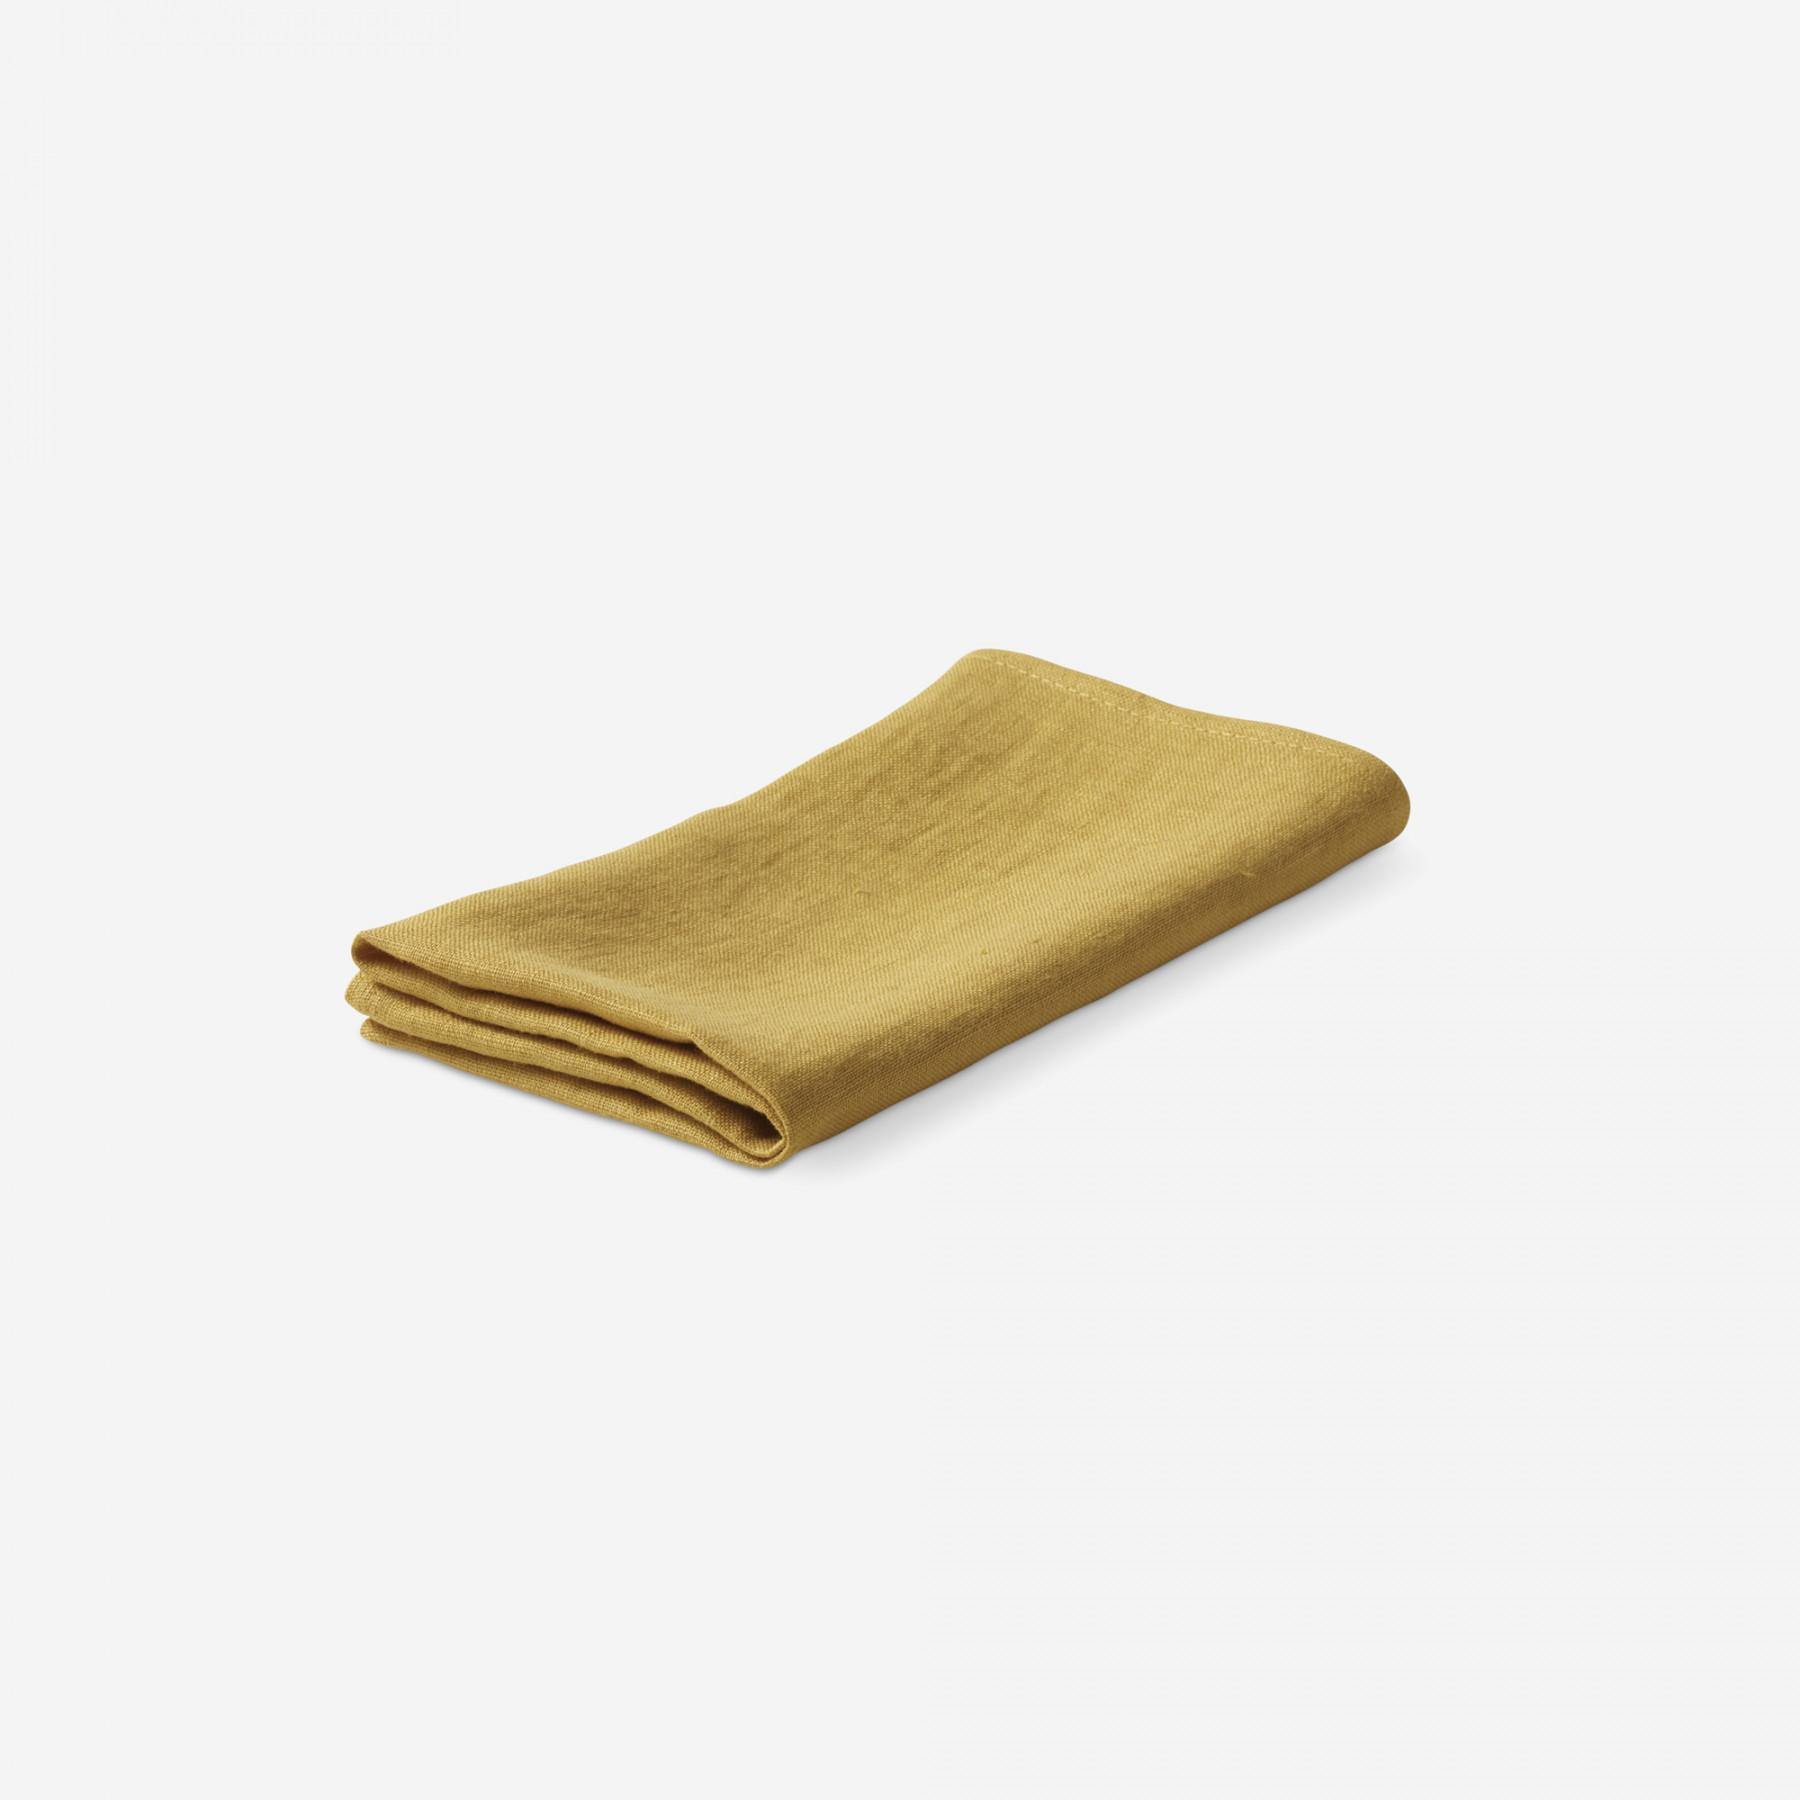 vipp Cloth Napkin Set yellow VIPP125, 12591, 5705953166814